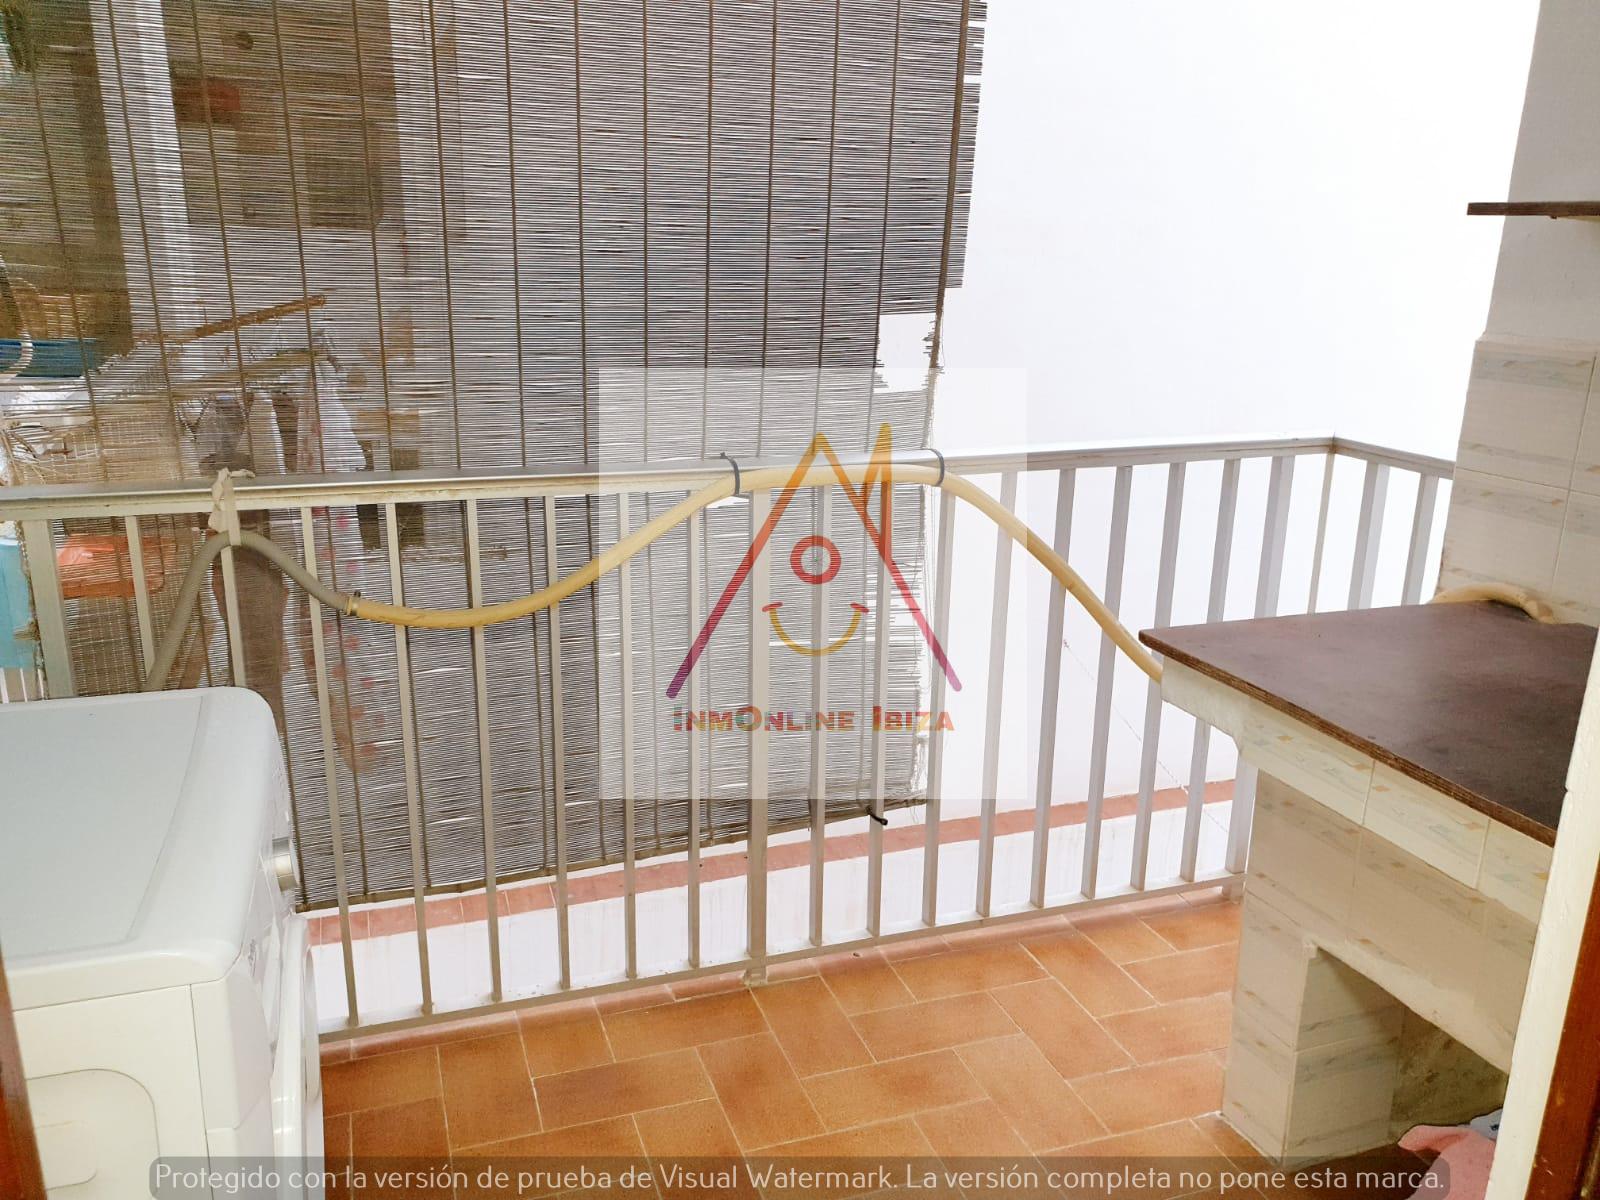 Rent Flat  Sant antoni de portmany. Estupendo apartamento con terraza en san antonio